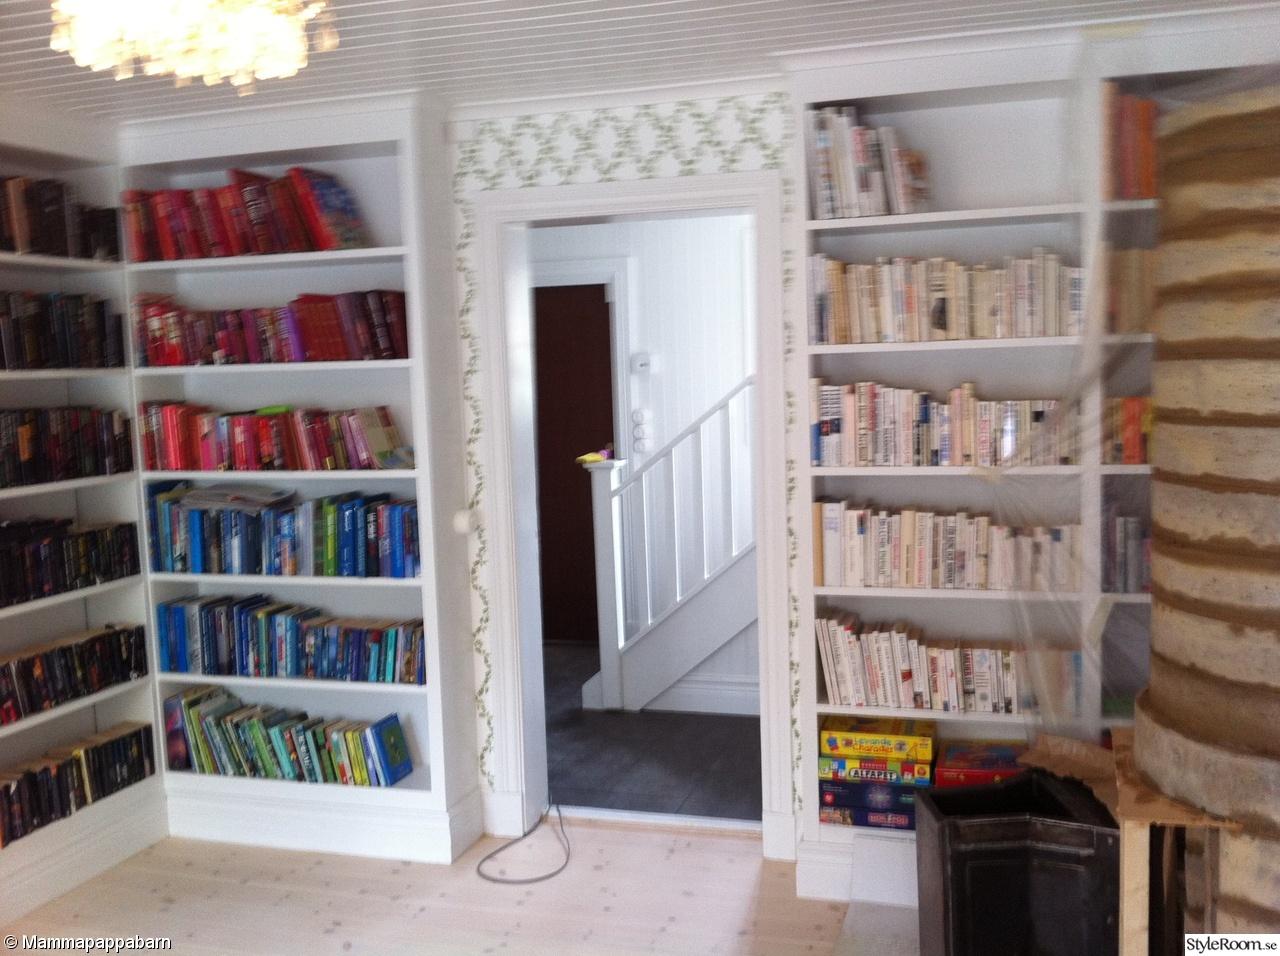 bokhyllor,inbyggda bokhyllor,sandbergs tapeter,bibliotek